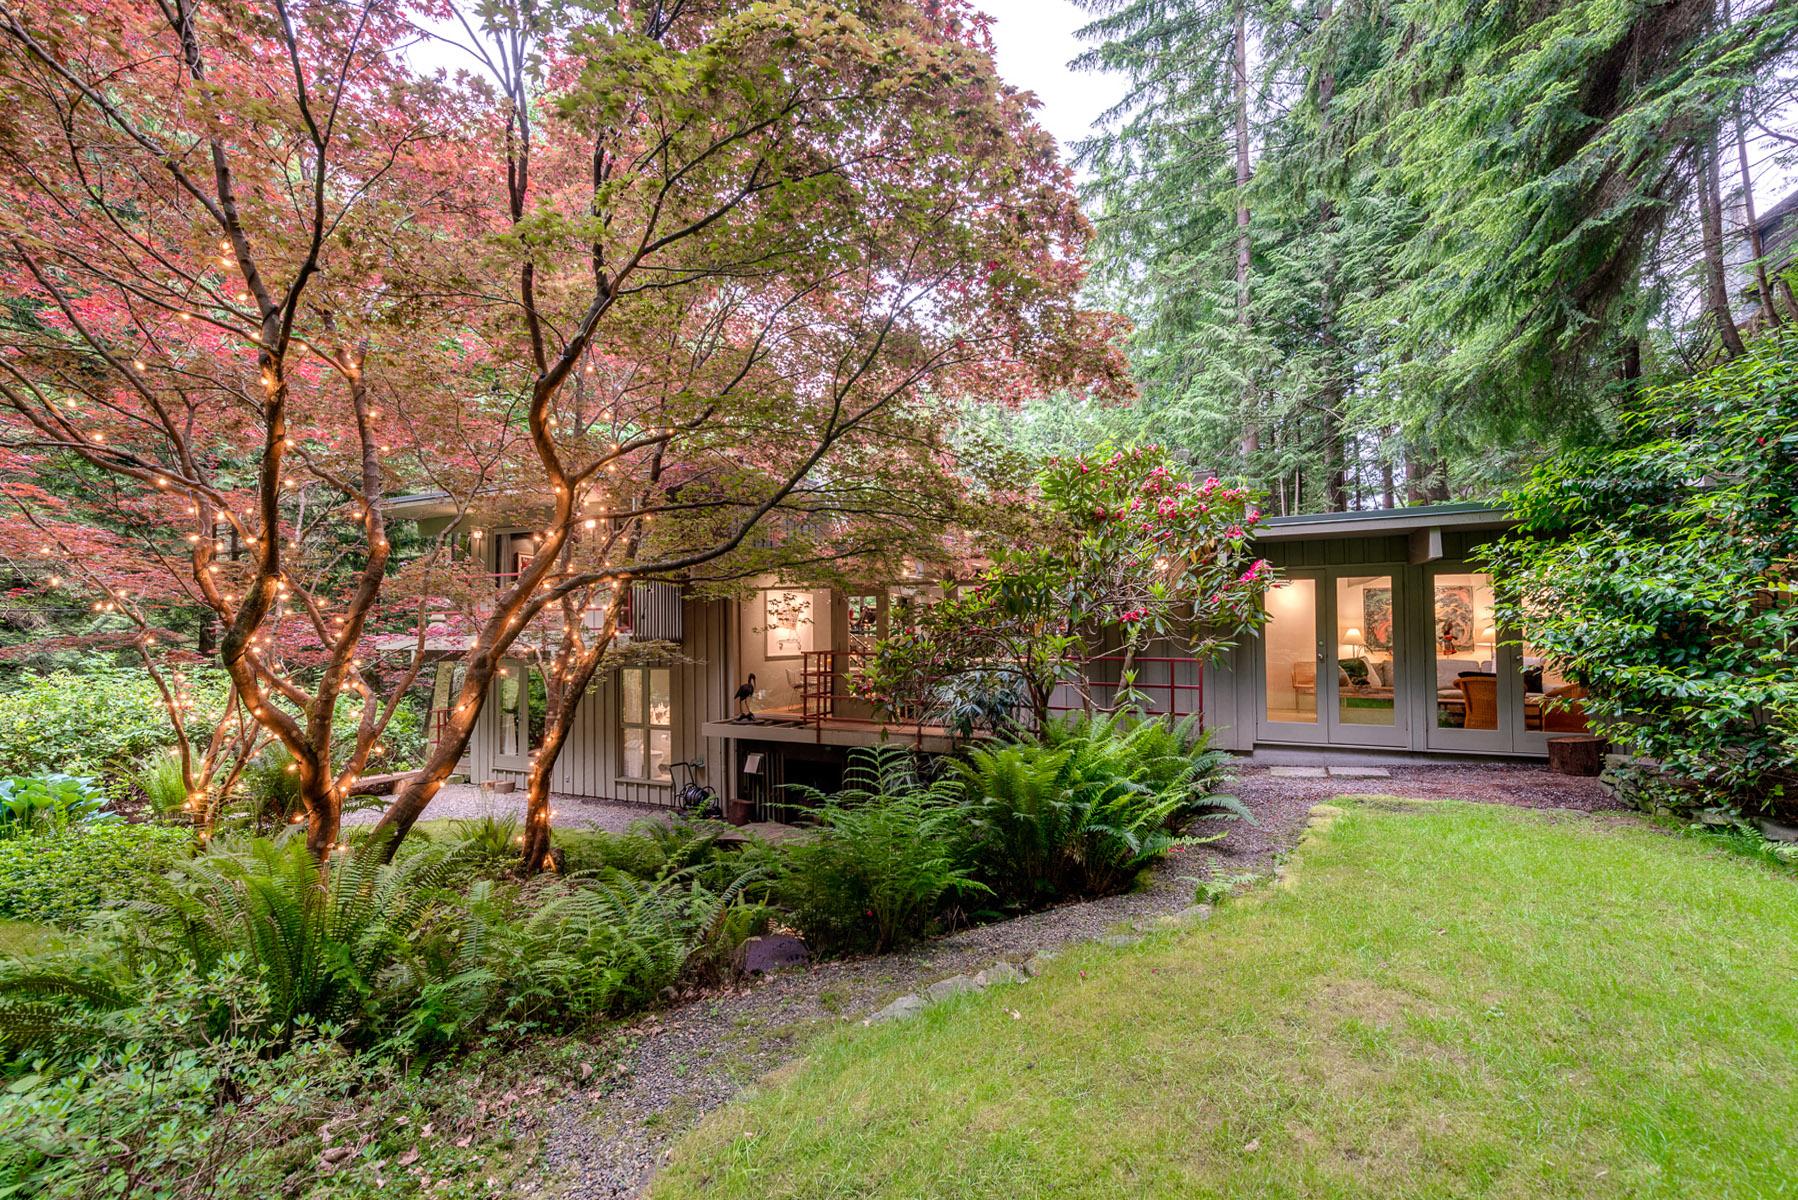 4301-Woodcrest-Road-West-Vancouver-360hometours-22s.jpg